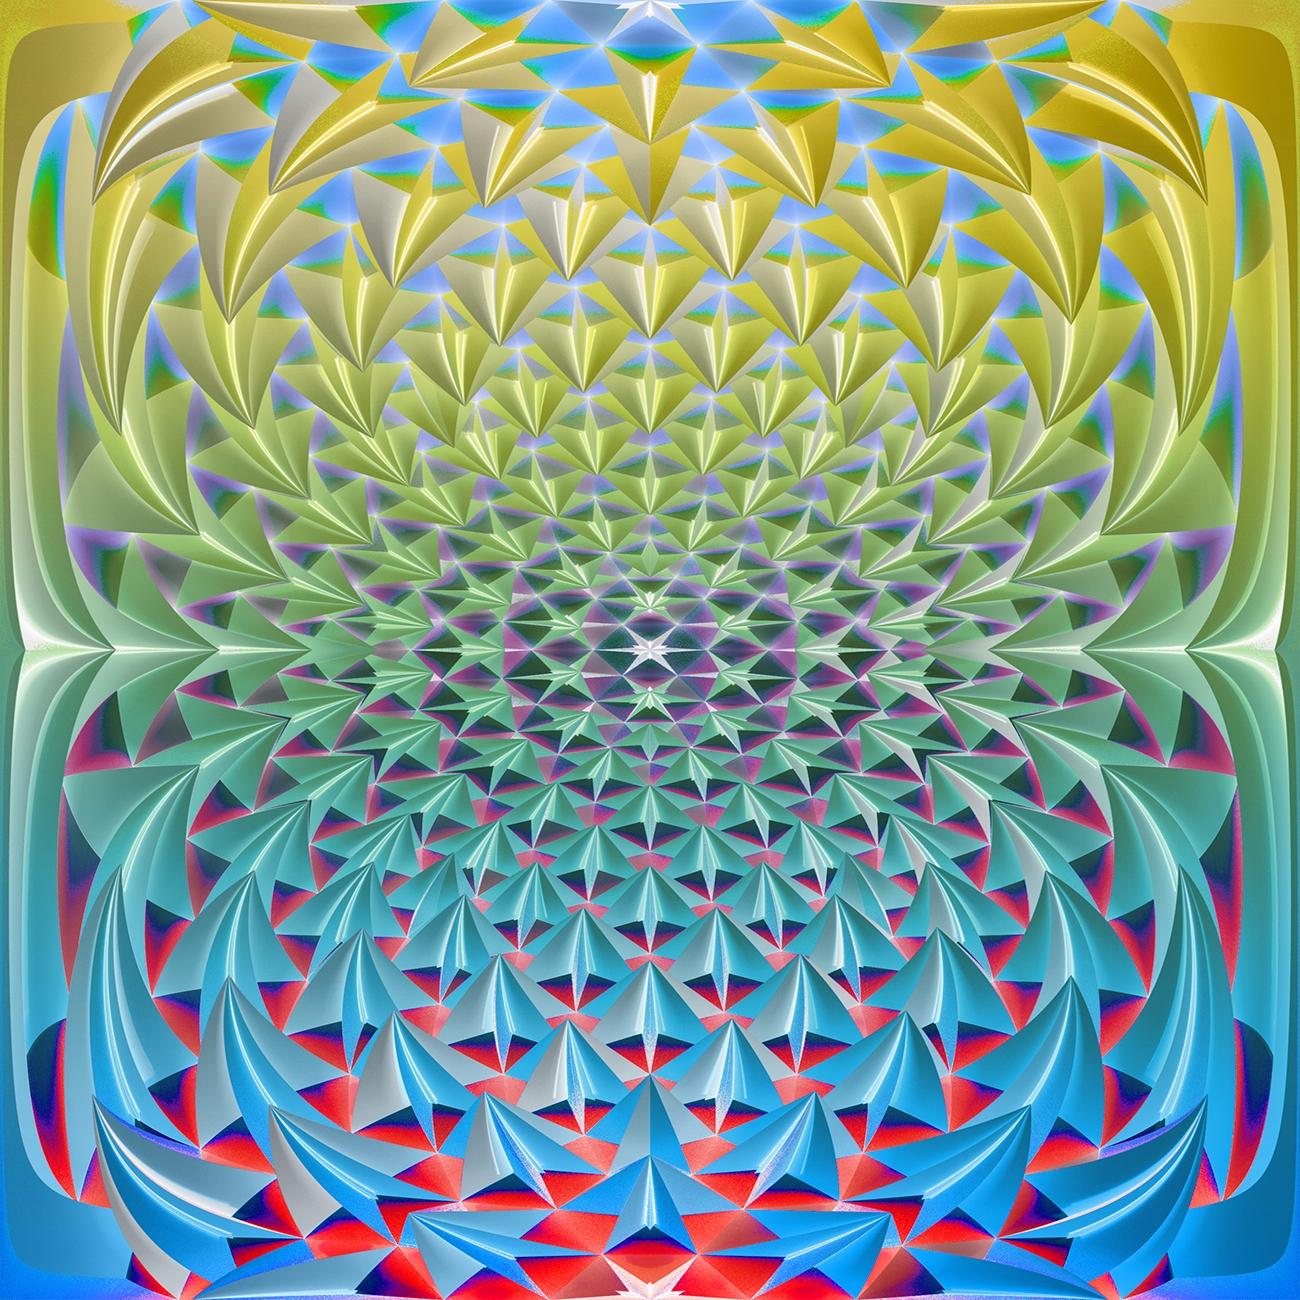 Biosphere digital artist fascin - sphericalart | ello